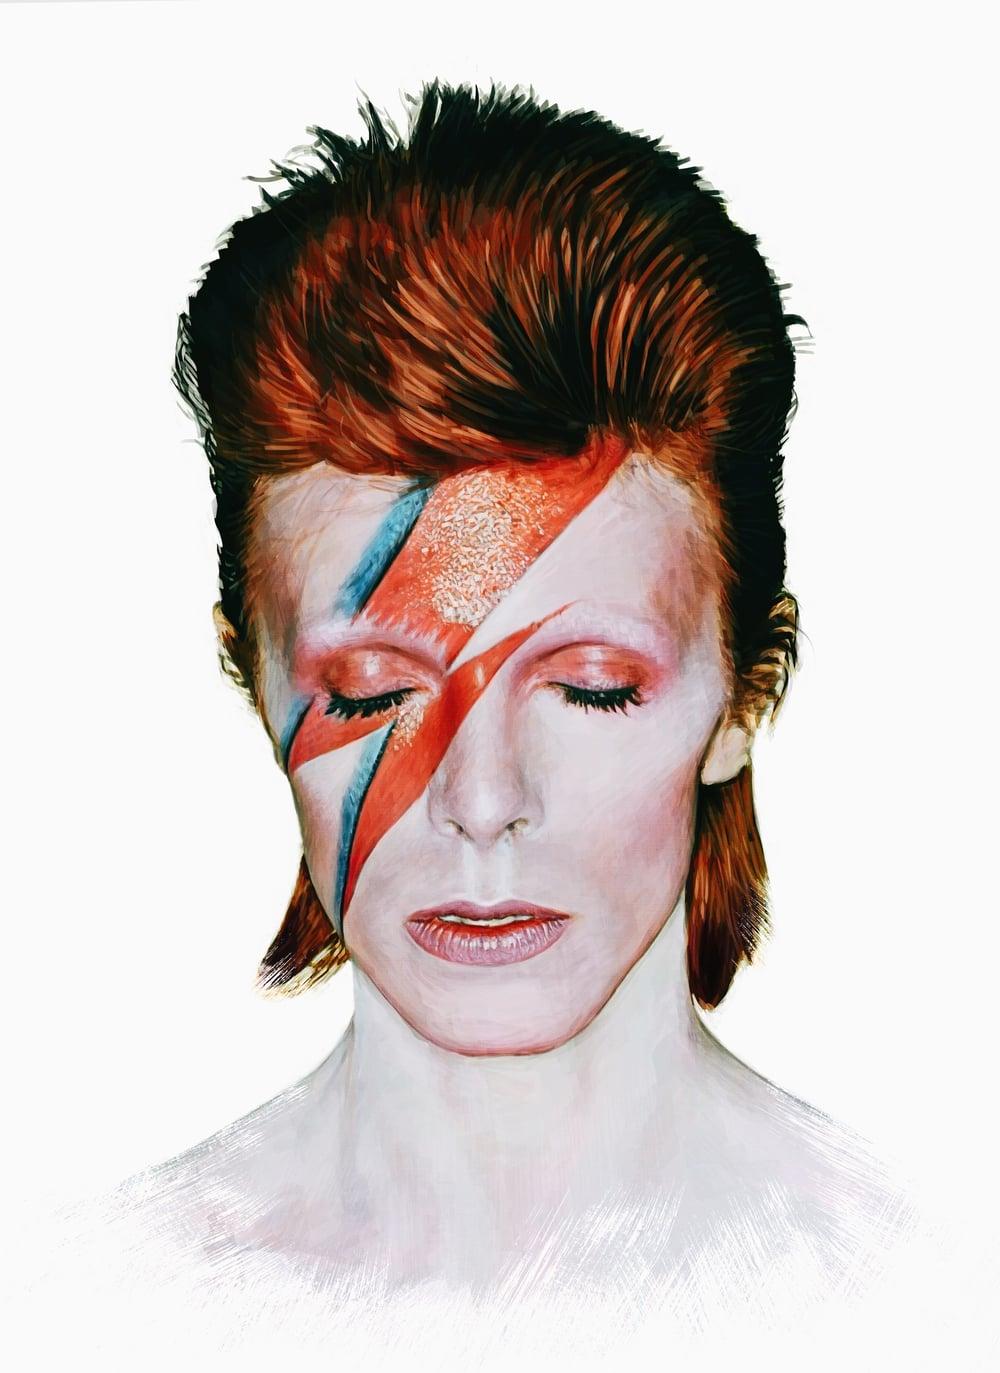 David Bowie Tribute Final copy.jpg